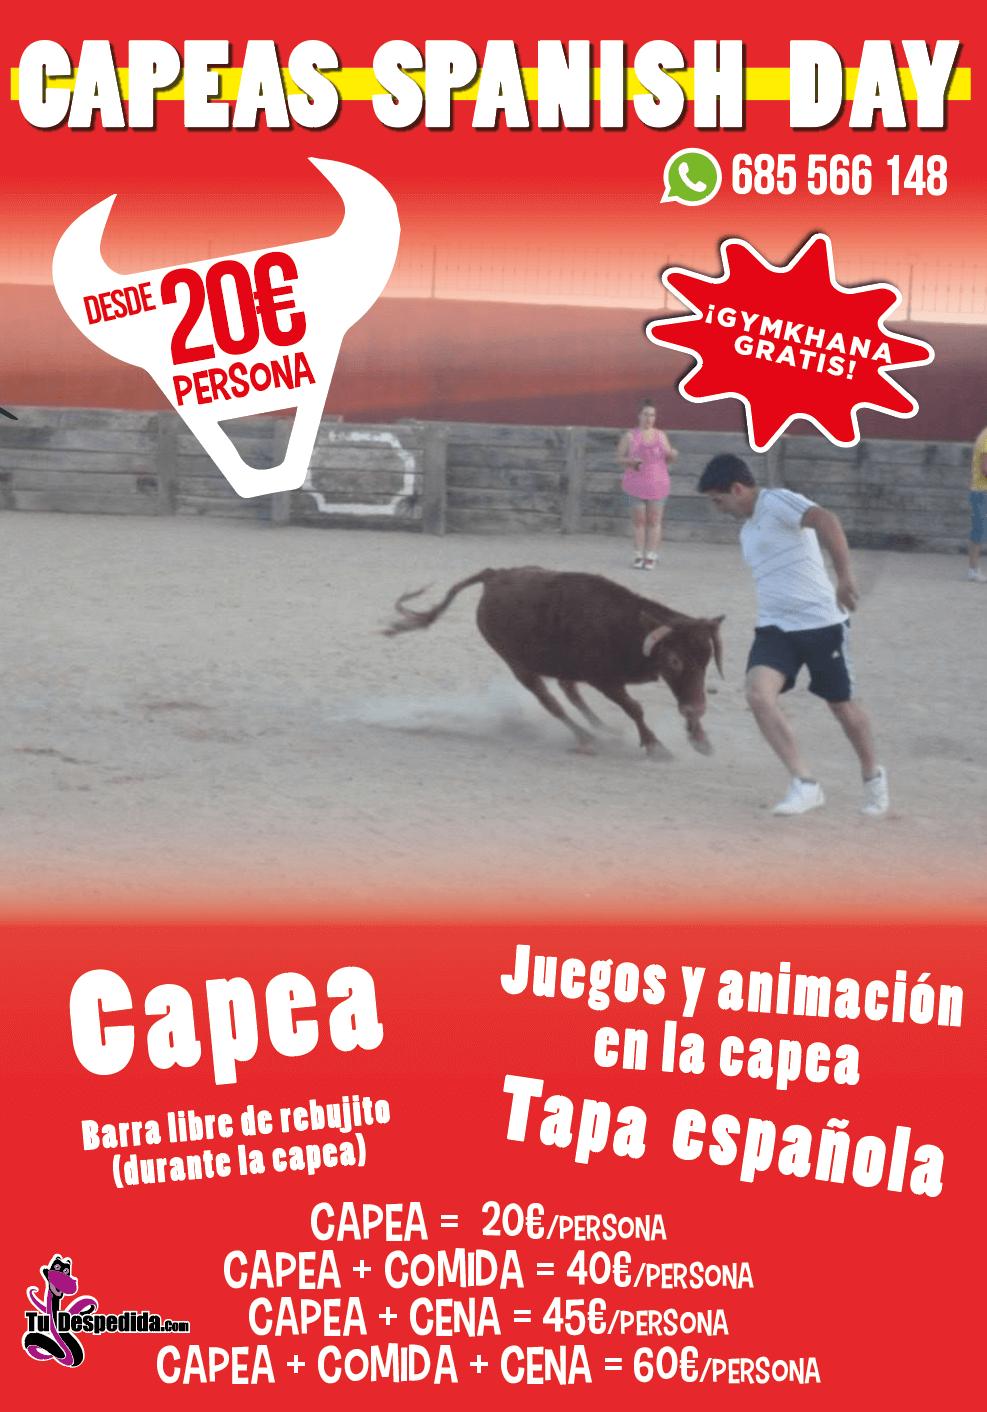 "Capeas Madrid"" width="